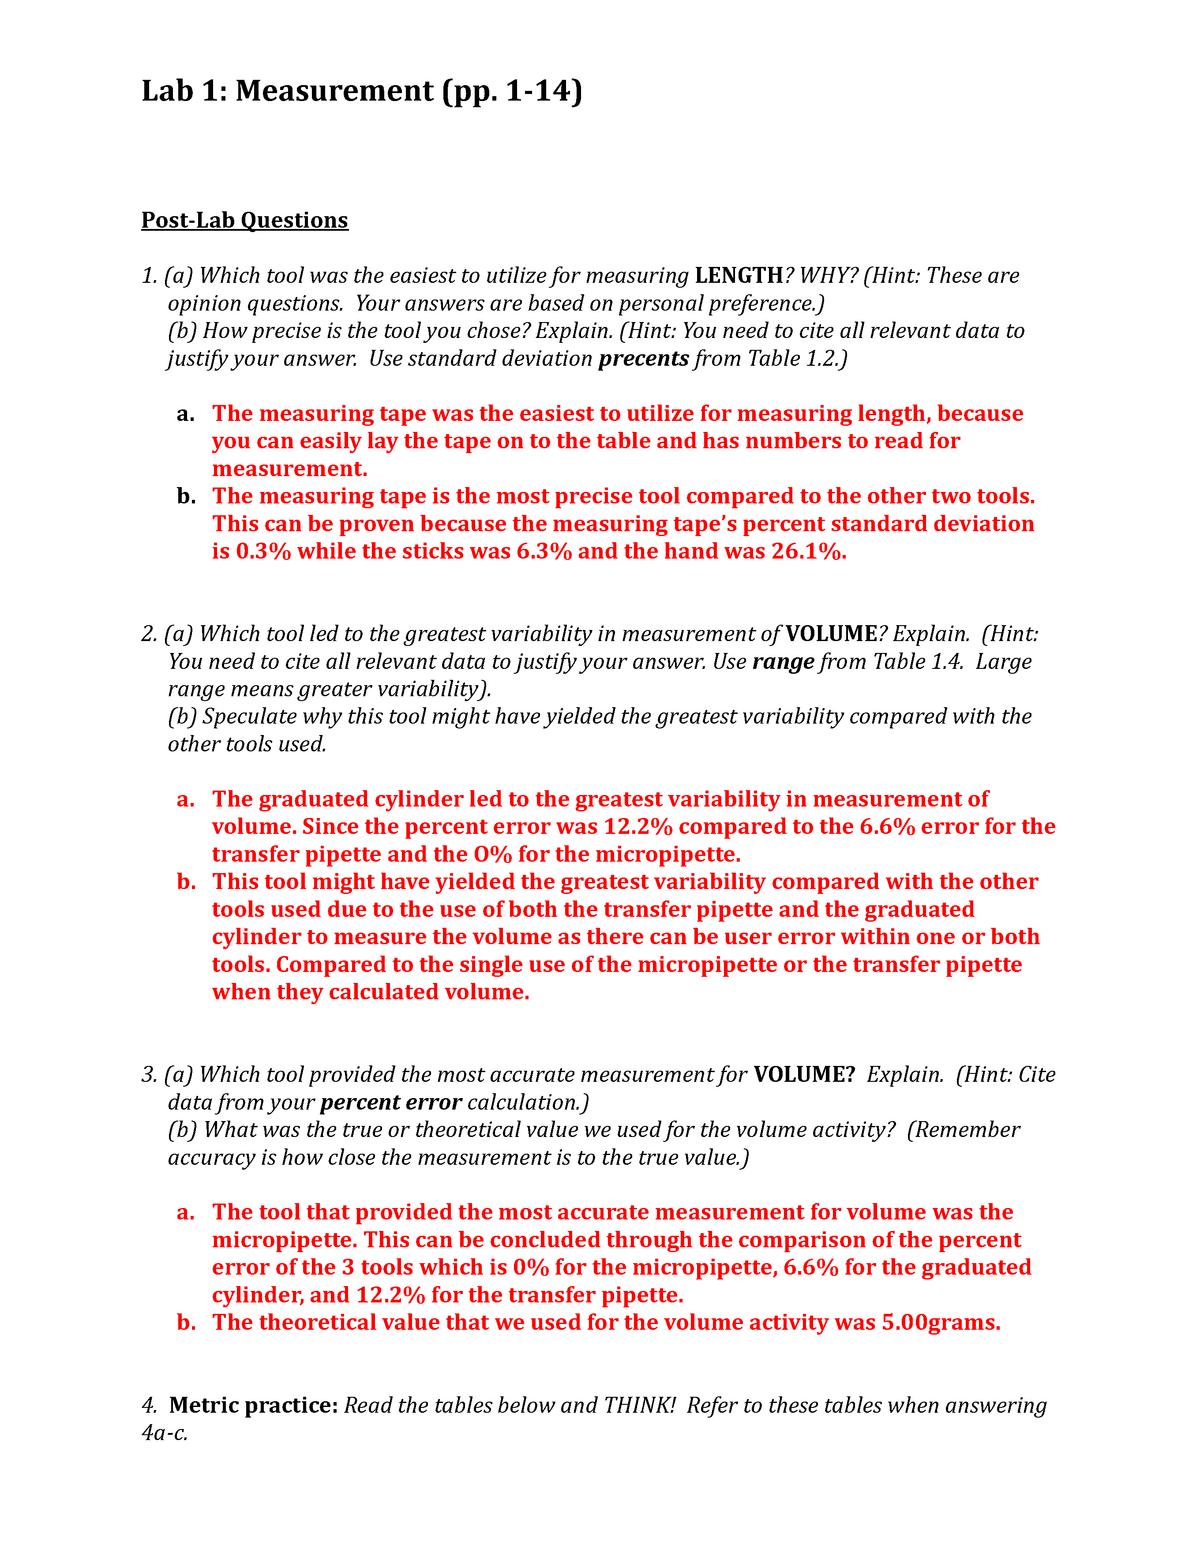 Lab 25: Measurement (pp. 25-254) - Lab 25: Measurement (pp. 25-254) Post In Percent Error Worksheet Answer Key